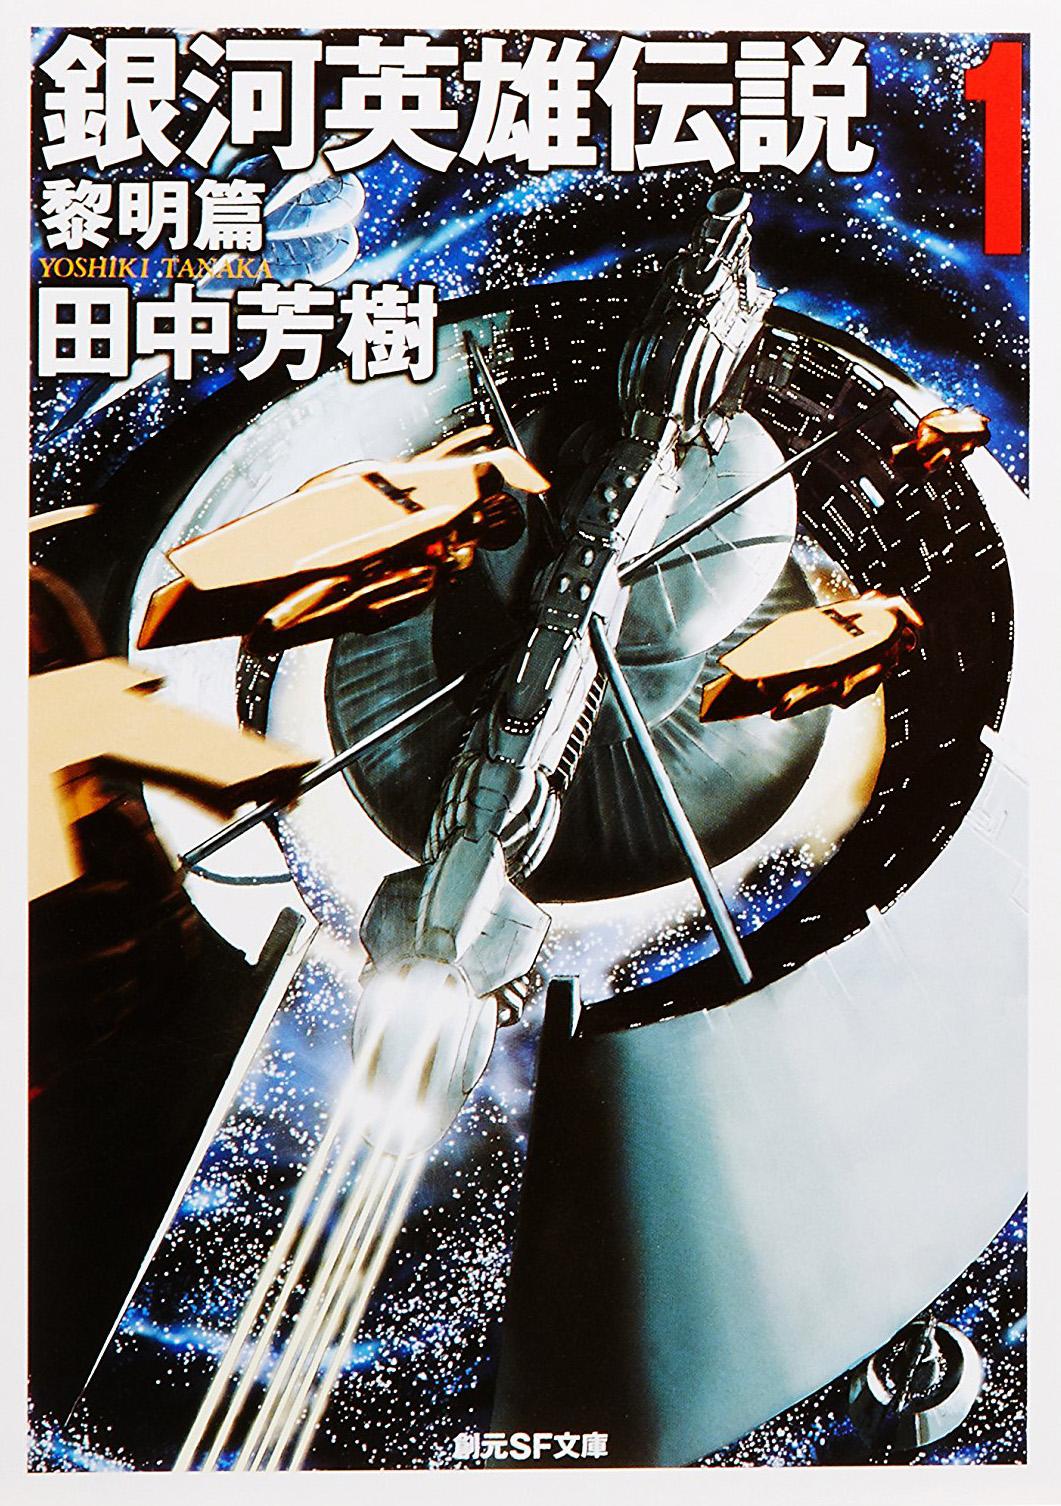 Legend of Galactic Heroes Light Novel cover